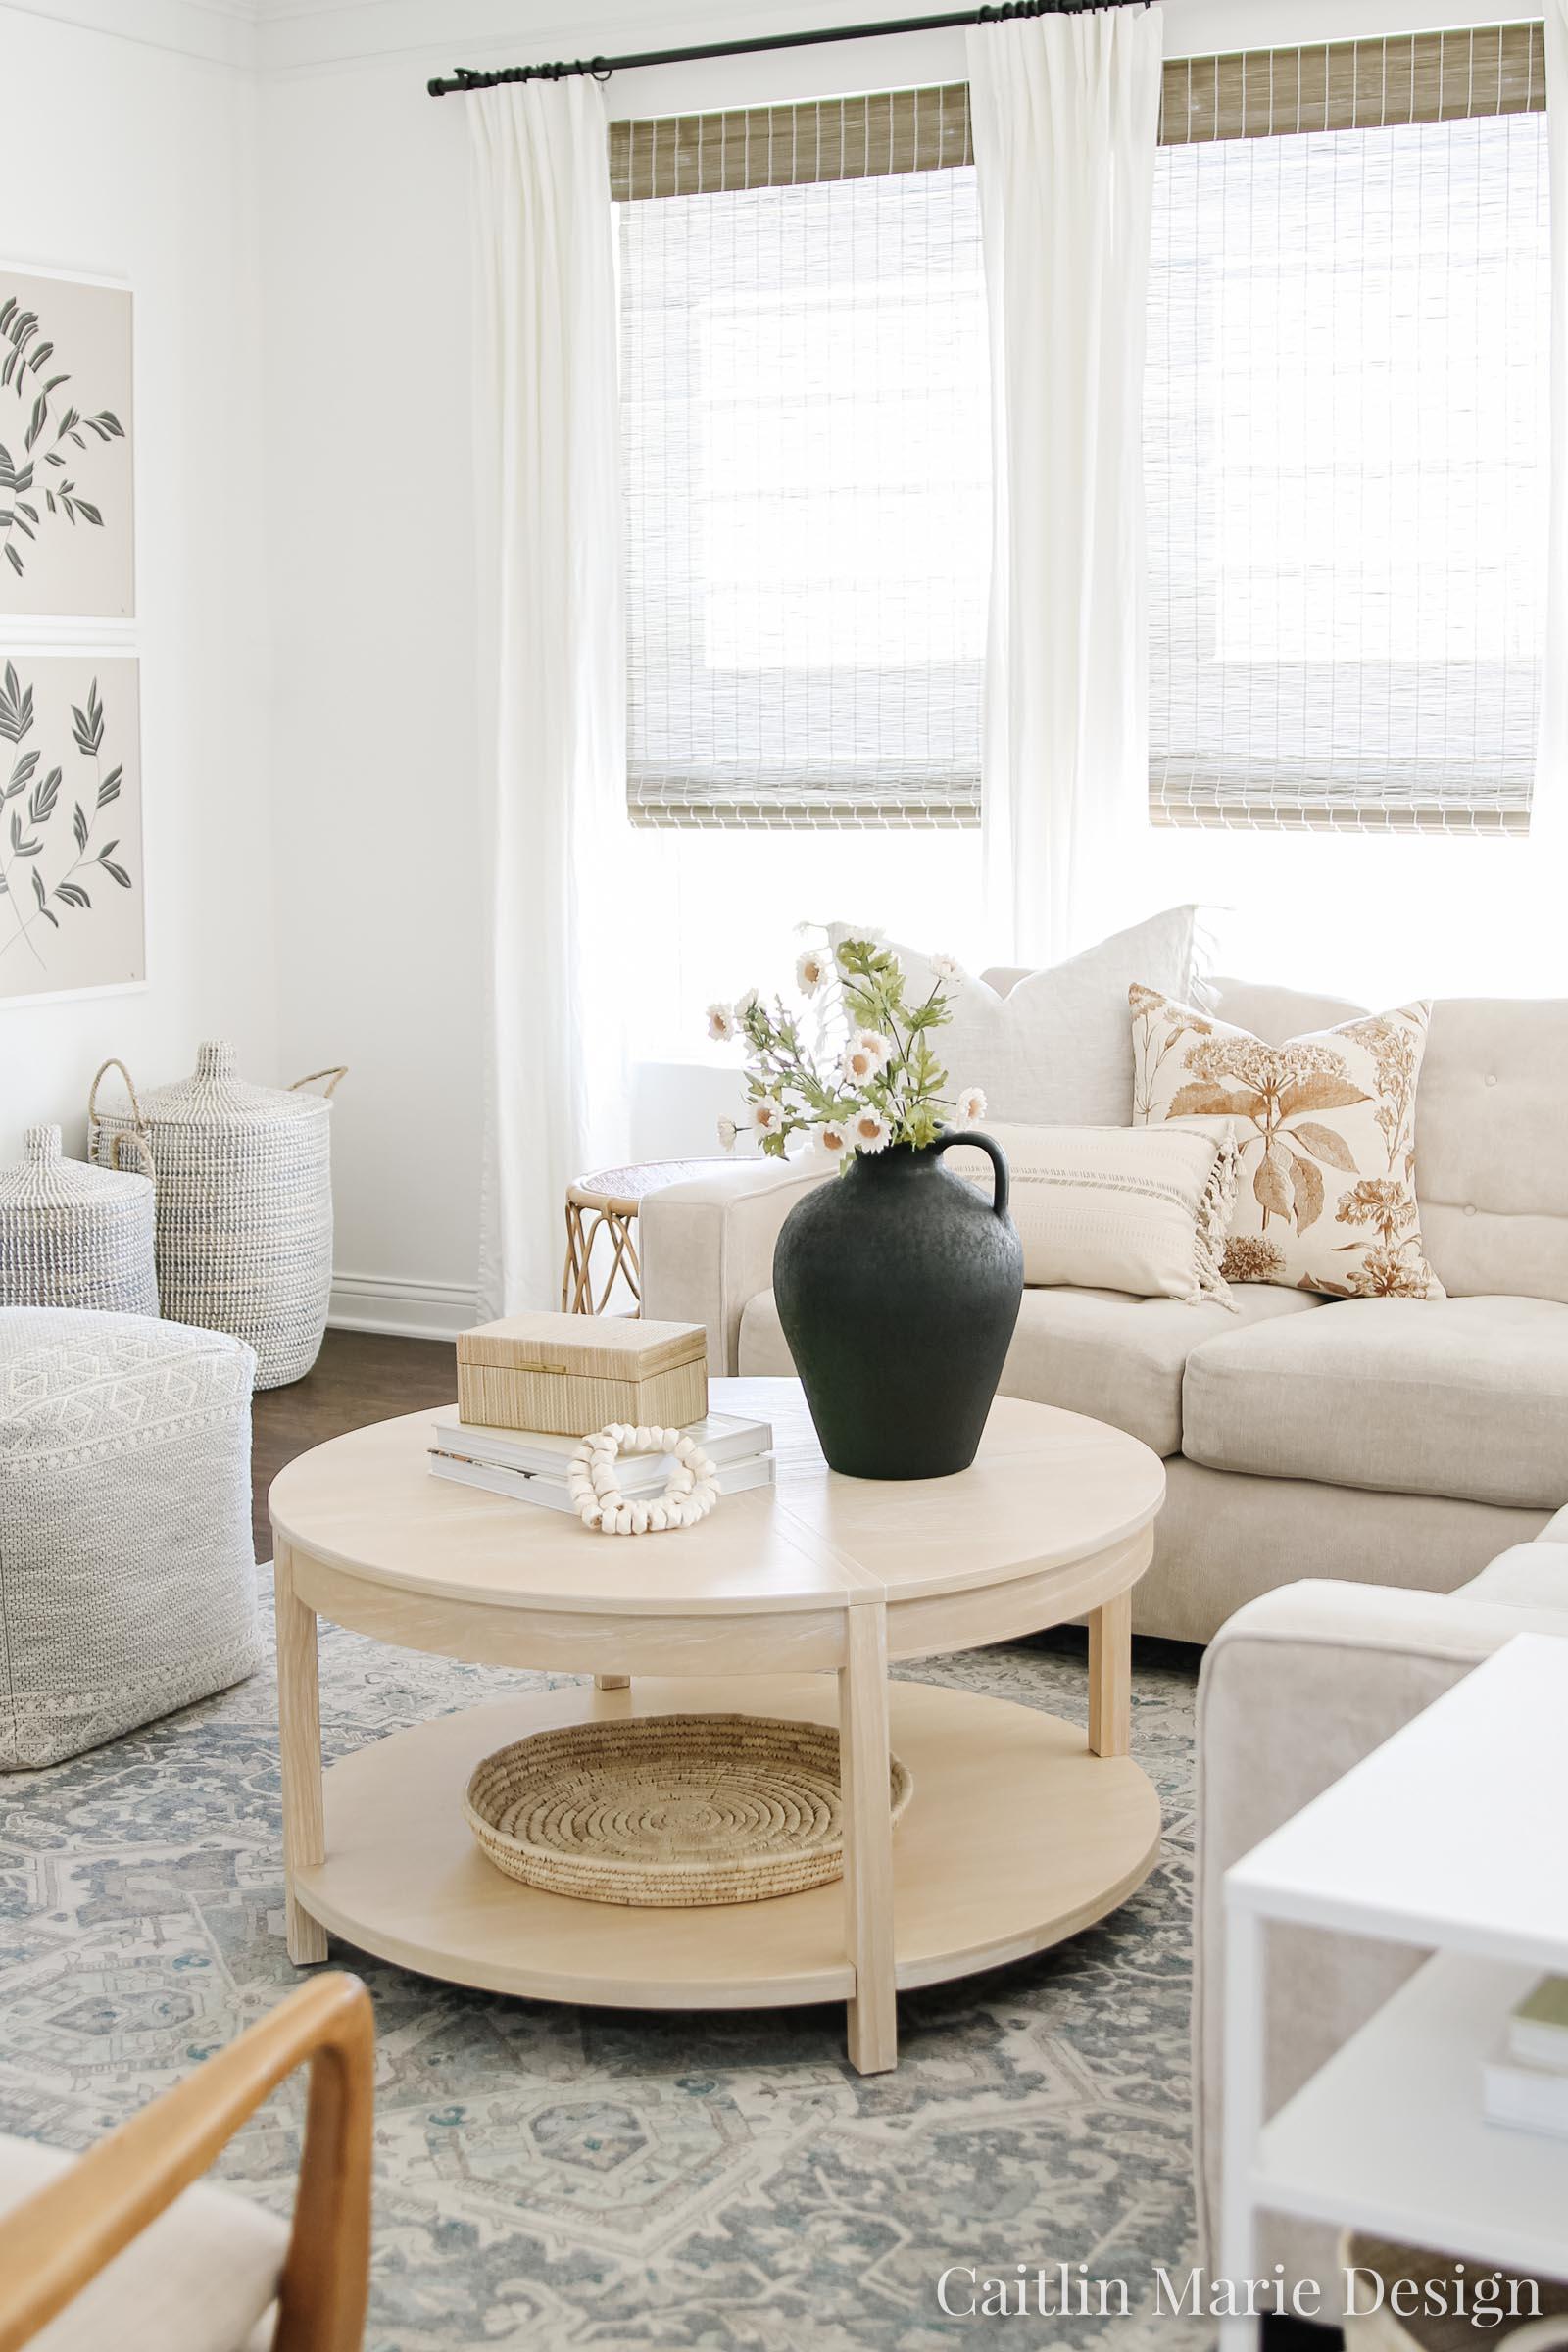 Minimalist Fall Decor | Fall Home Tour 2020 | coastal farmhouse, round coffee table, black vase, modern traditional, blue area rug, bone beads